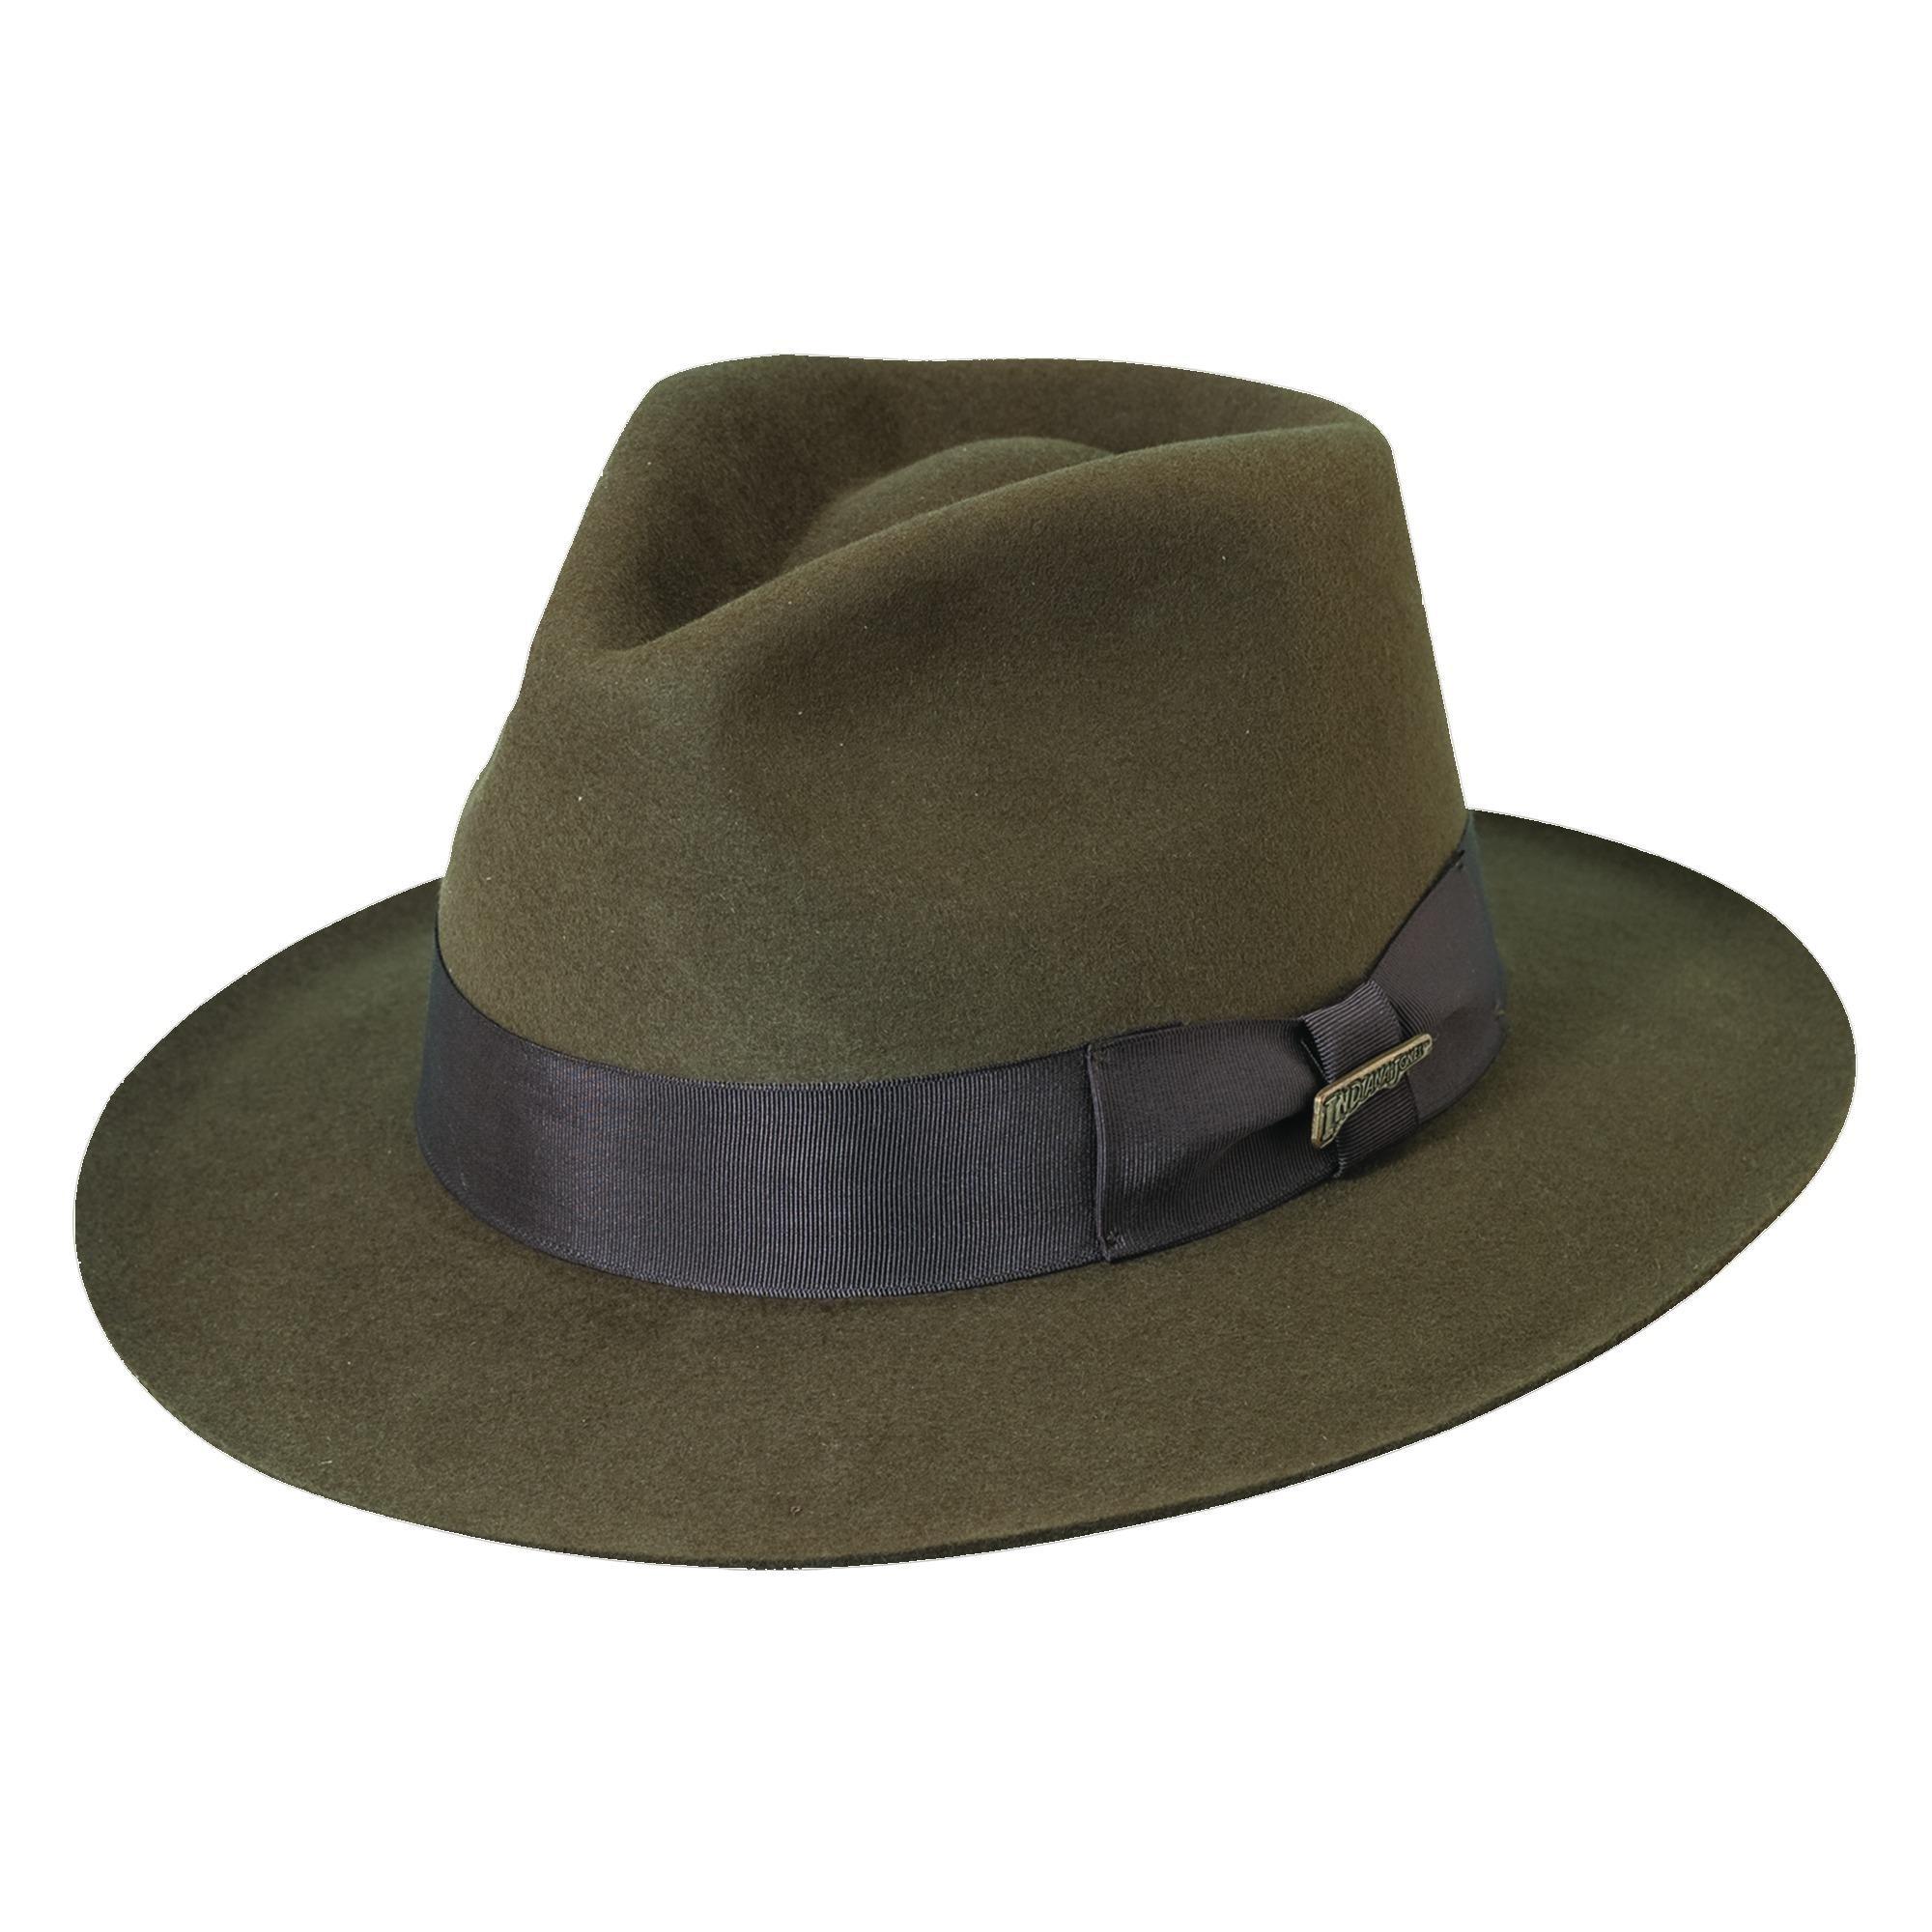 2d4e04d1727 Shop Dorfman Pacific Men s Fur Felt Indiana Jones 2.5 Inch Brim Fedora Hat  - Free Shipping Today - Overstock - 14281950